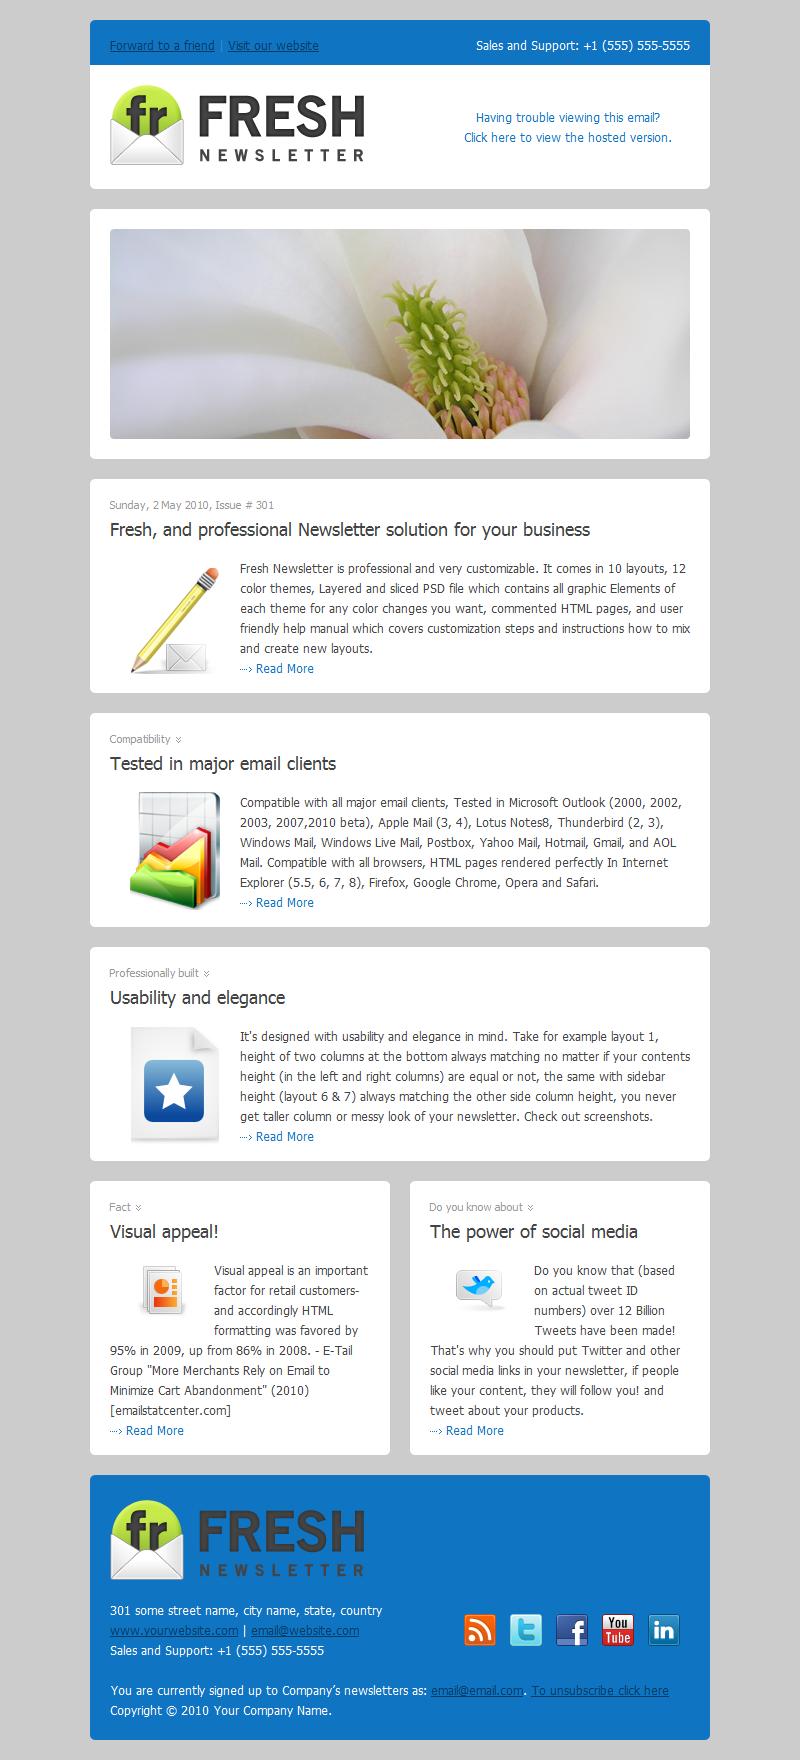 10 email templates best practices for e marketing. Black Bedroom Furniture Sets. Home Design Ideas